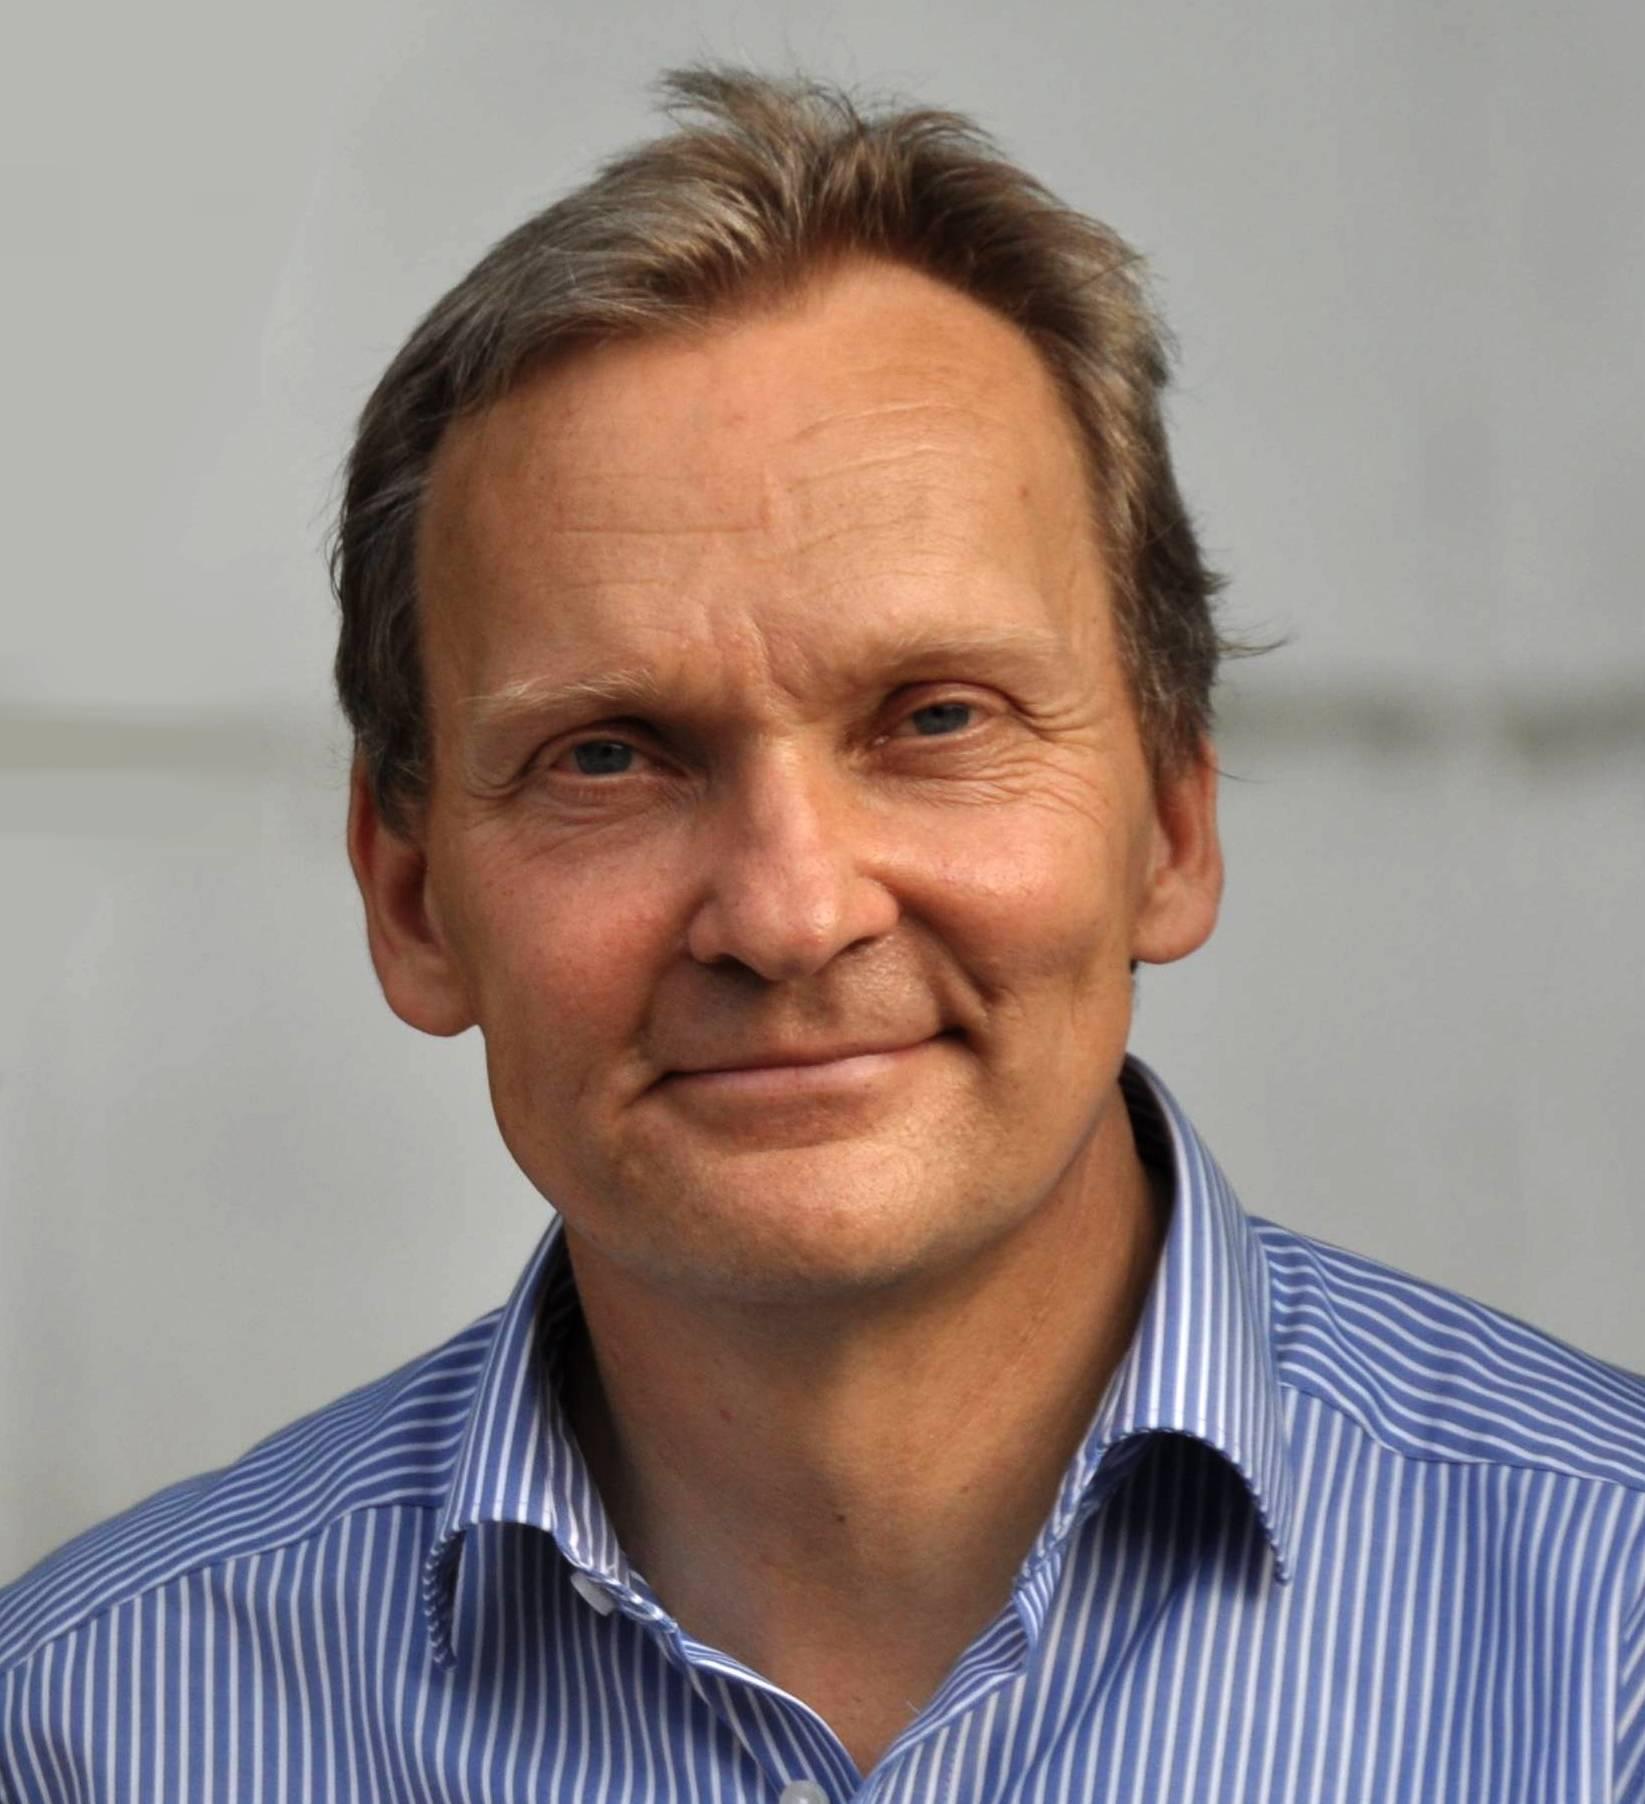 Stephan Laage-Witt